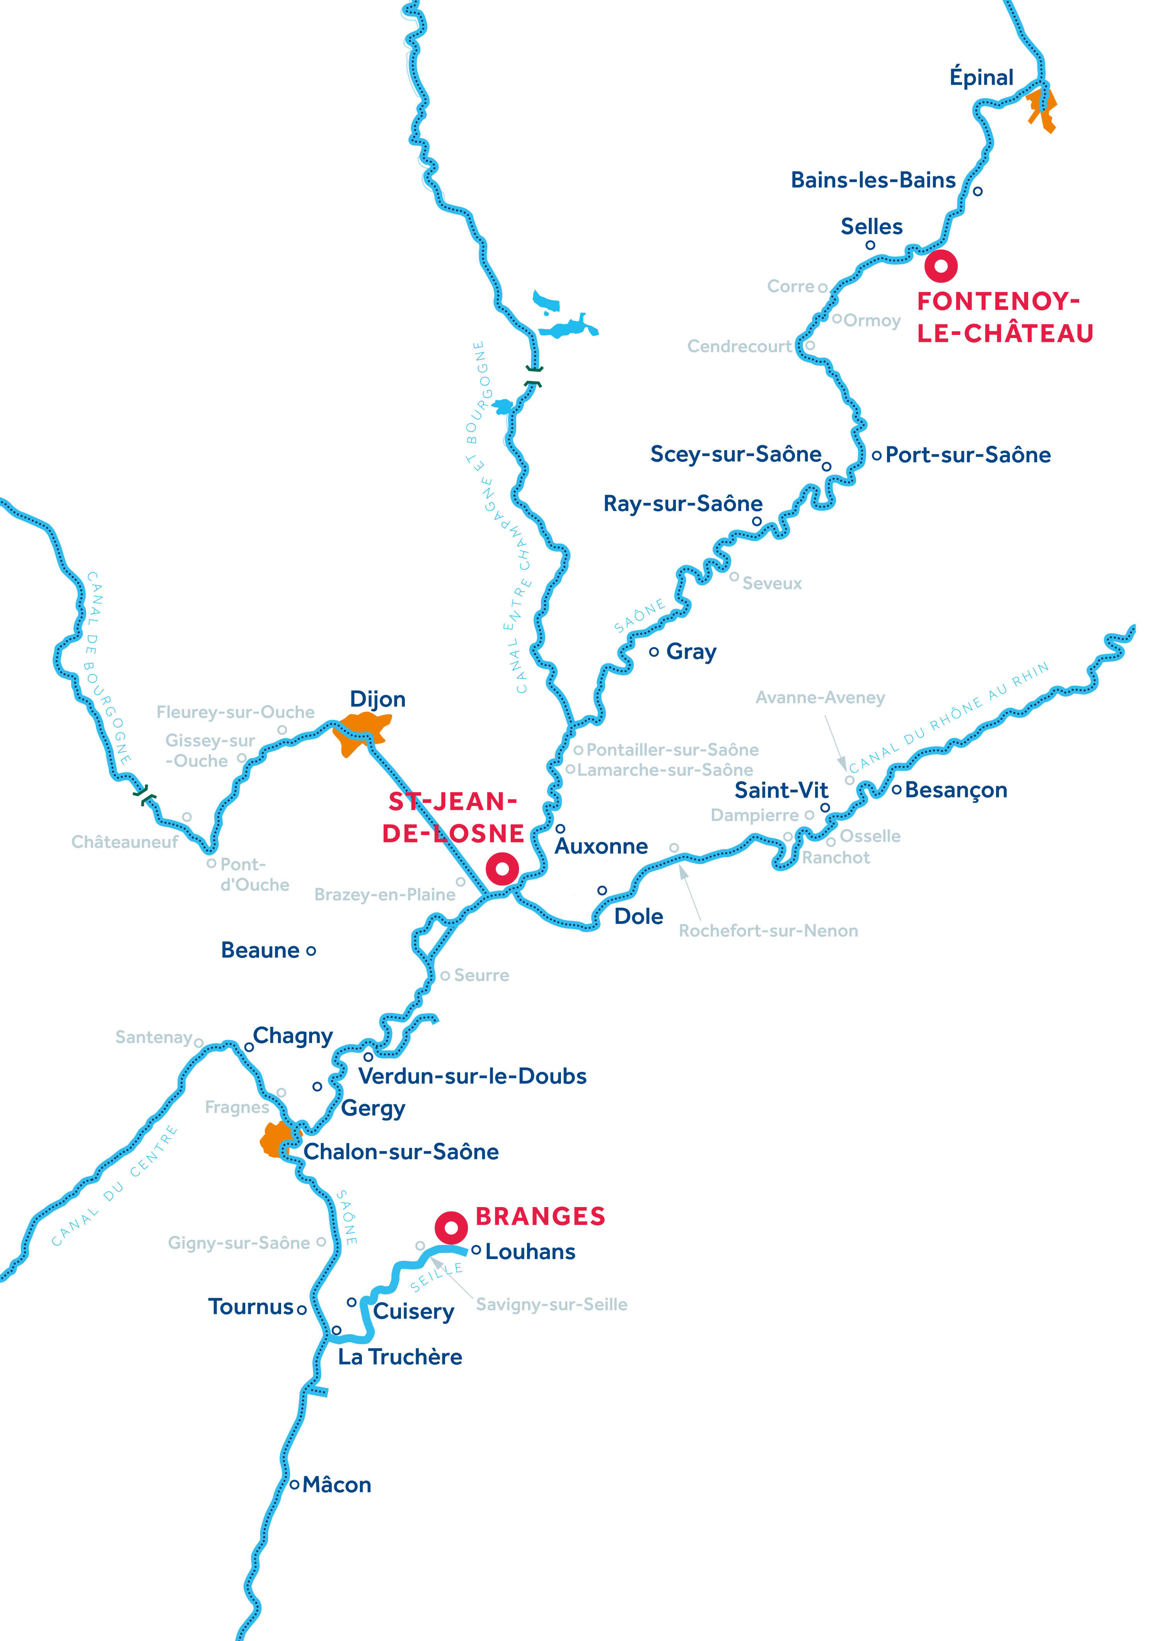 Mappa: Borgogna: Franche-Comté